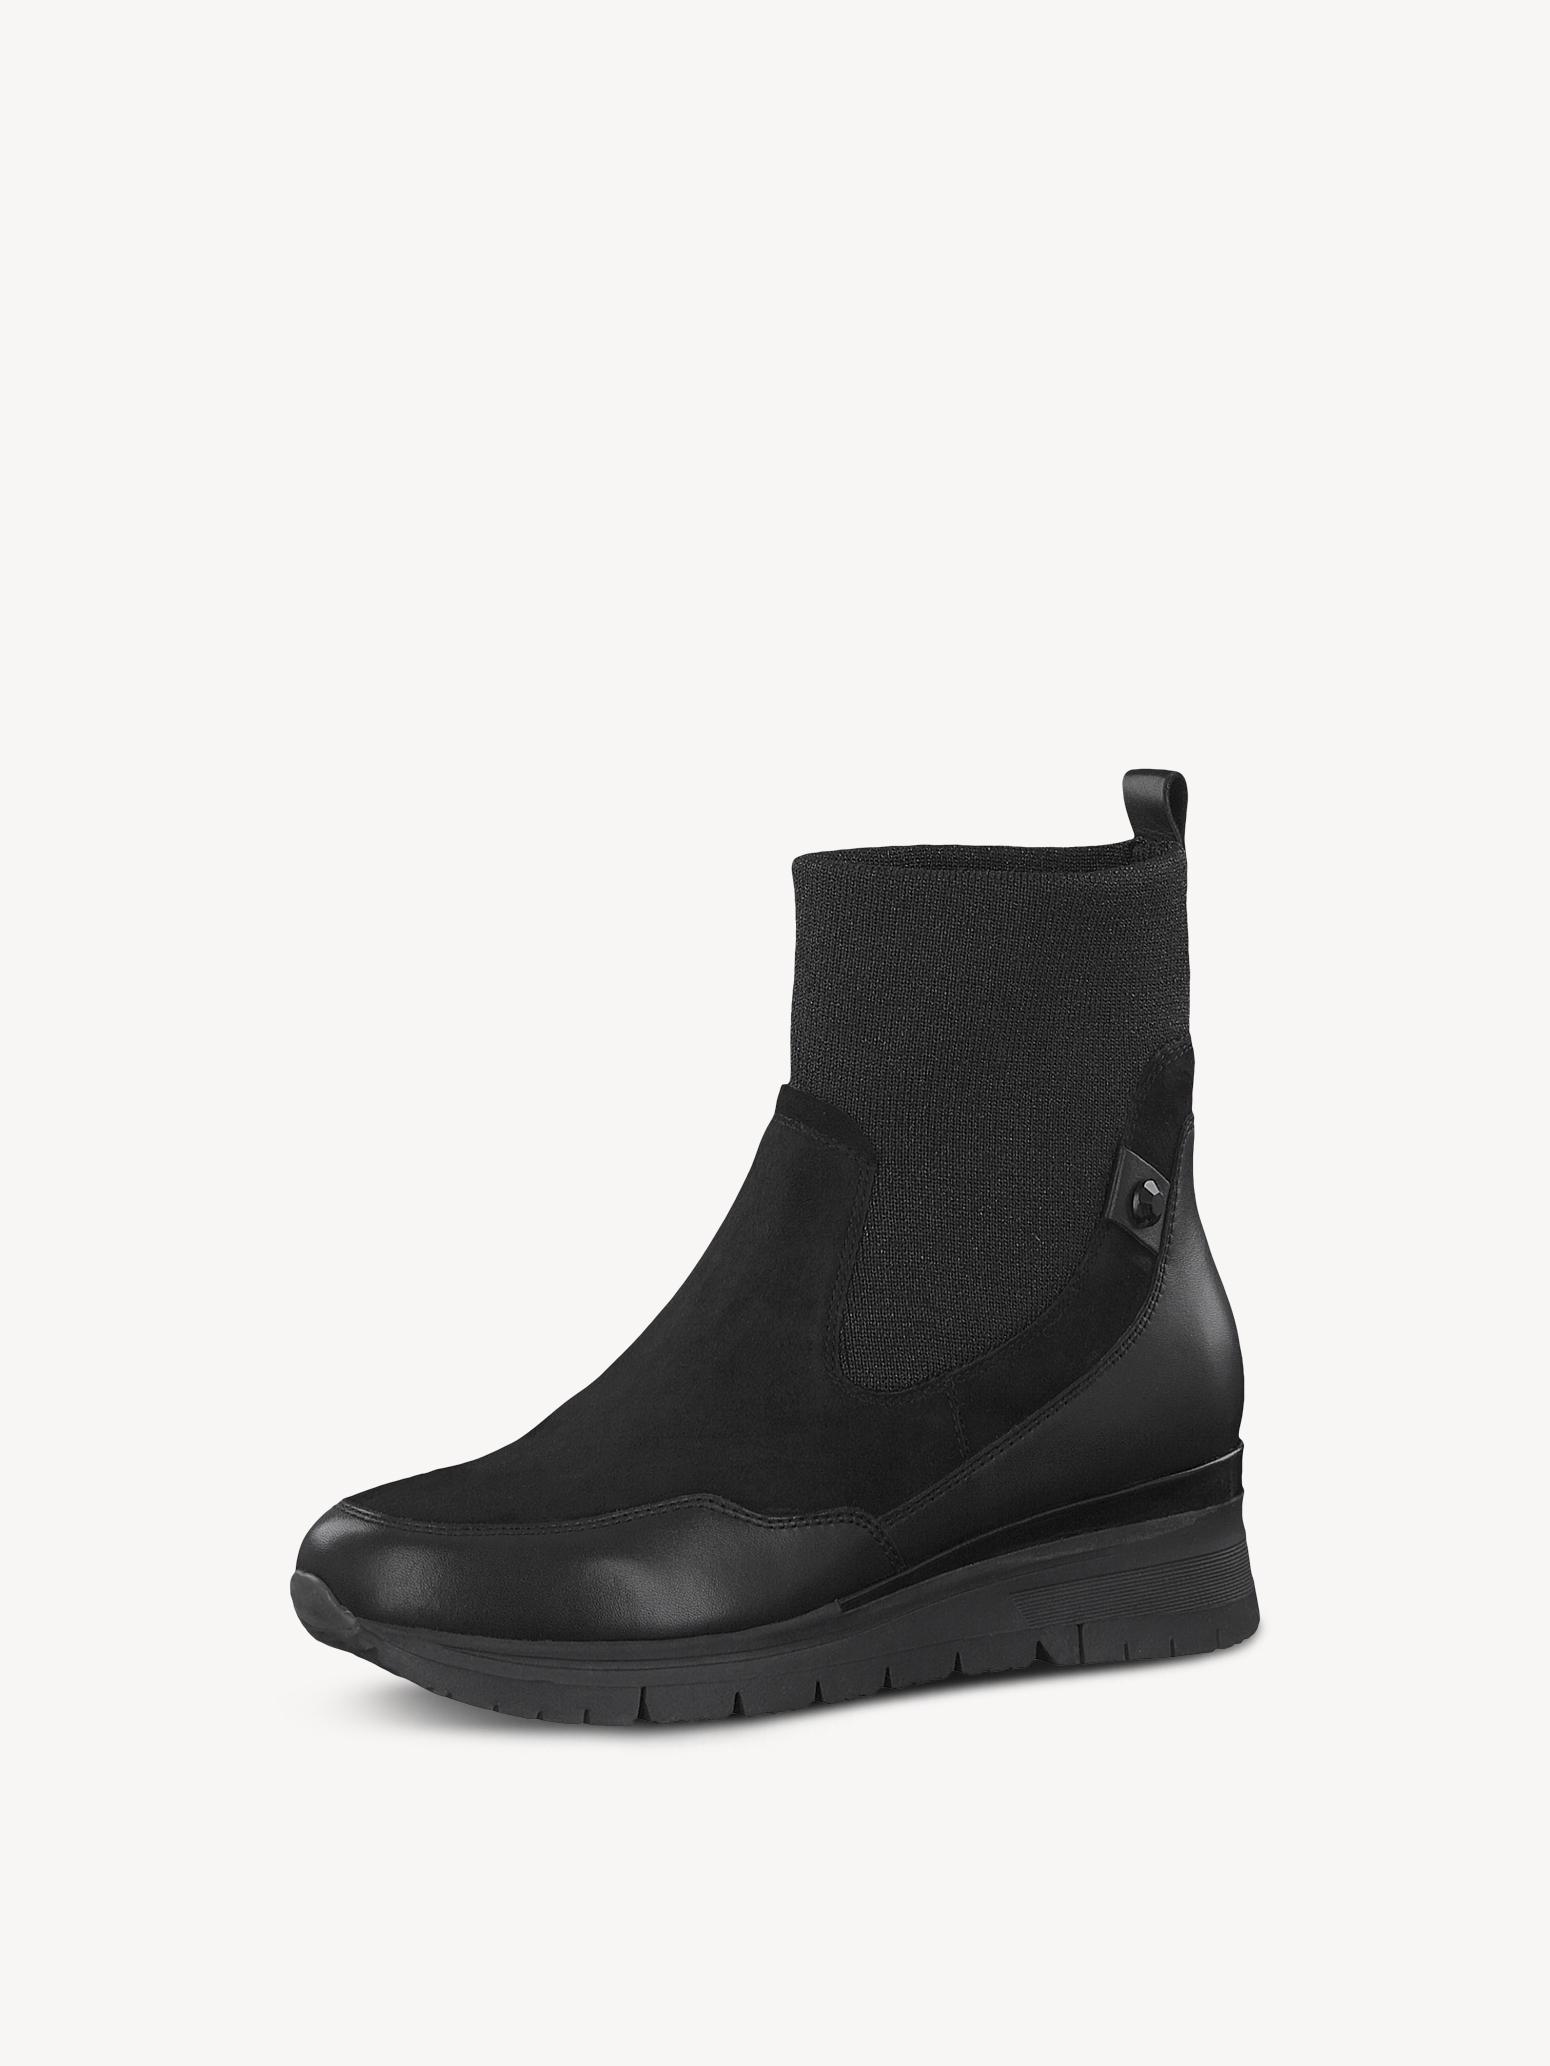 25409 Kaufen Sneaker 1 Online 1 23Tamaris UVjLqSGMzp